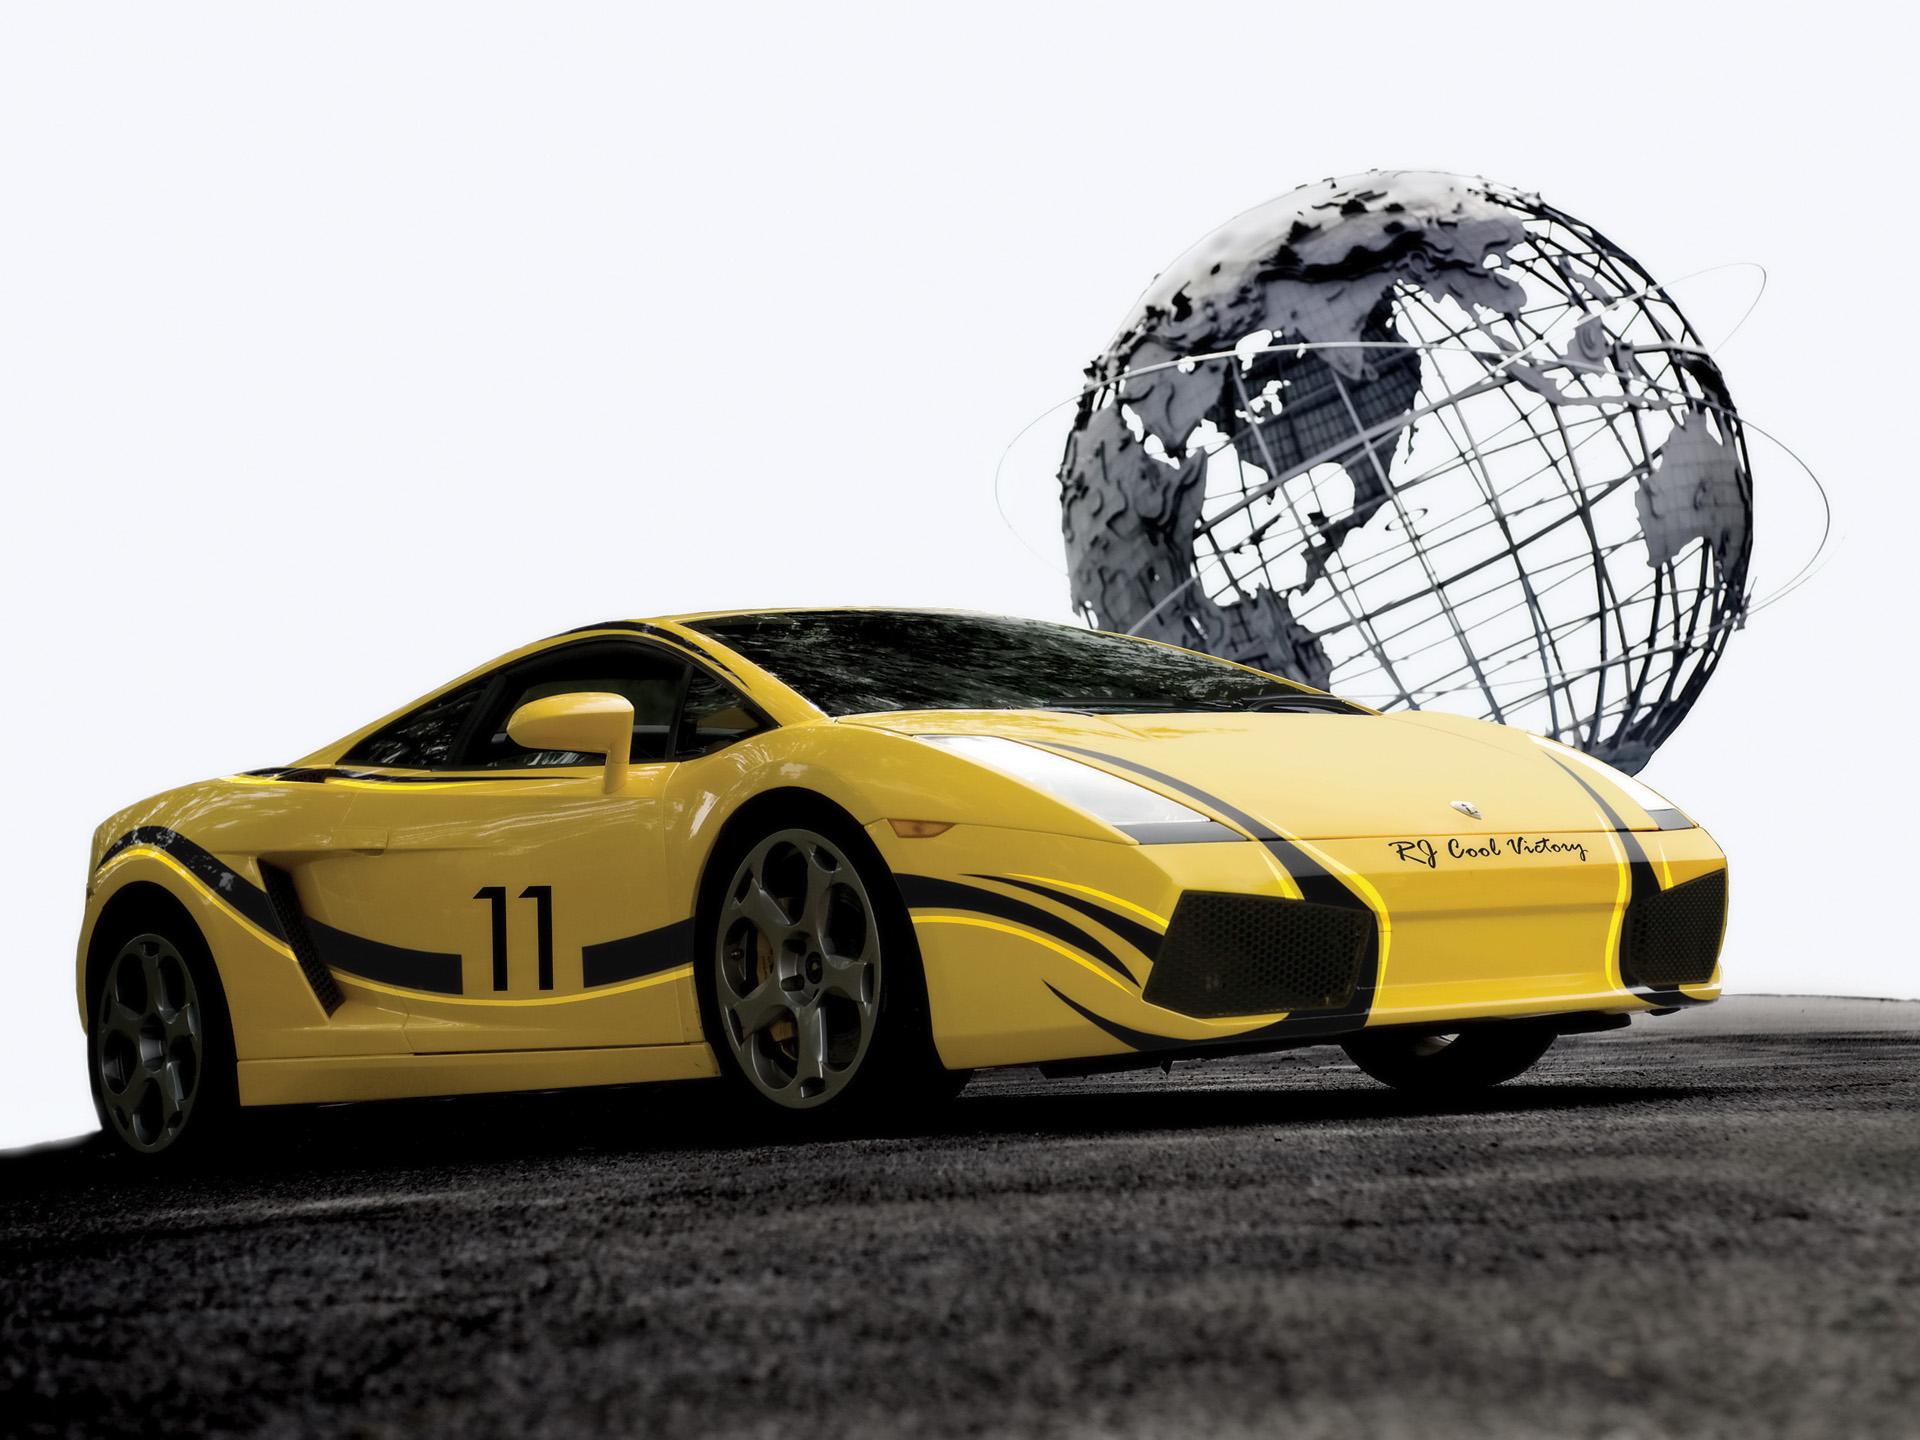 HD Wallpapers 2009 Cool Victory Lamborghini Gallardo